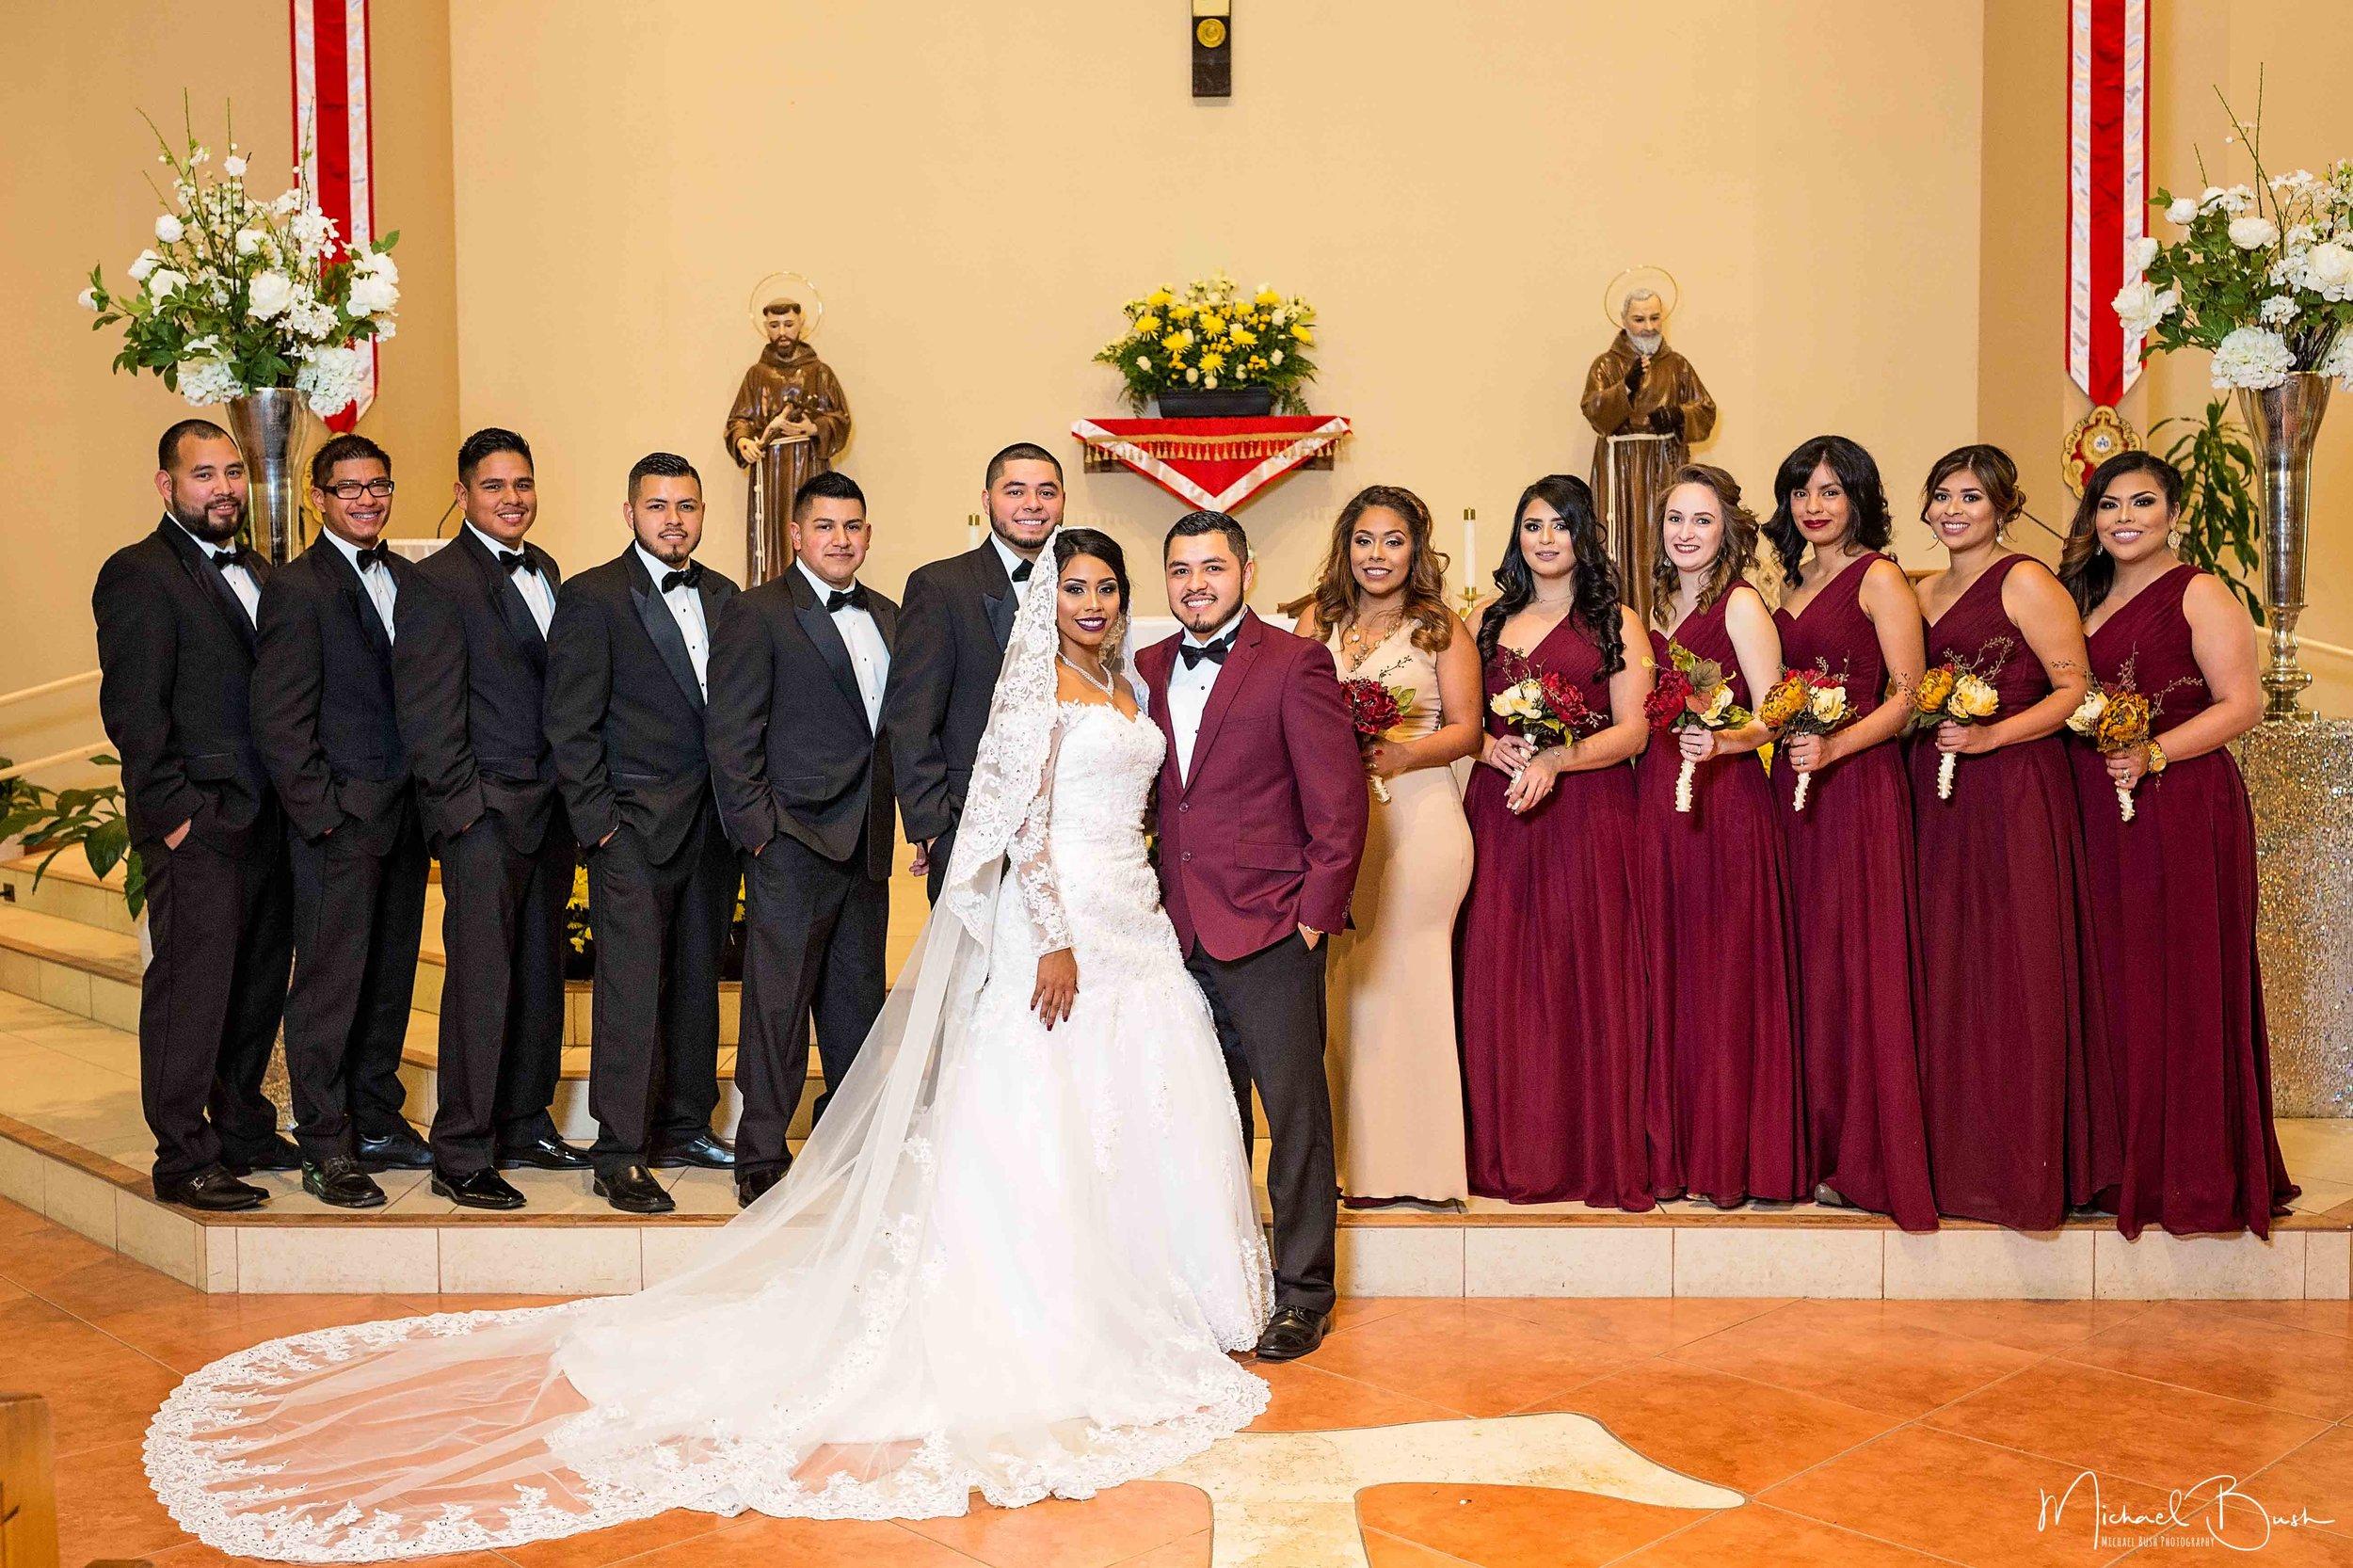 Wedding-Details-Bride-Fort Worth-colors-Ceremony-weddingceremony-brides-groom-ido-church-married-bridalparty.jpg